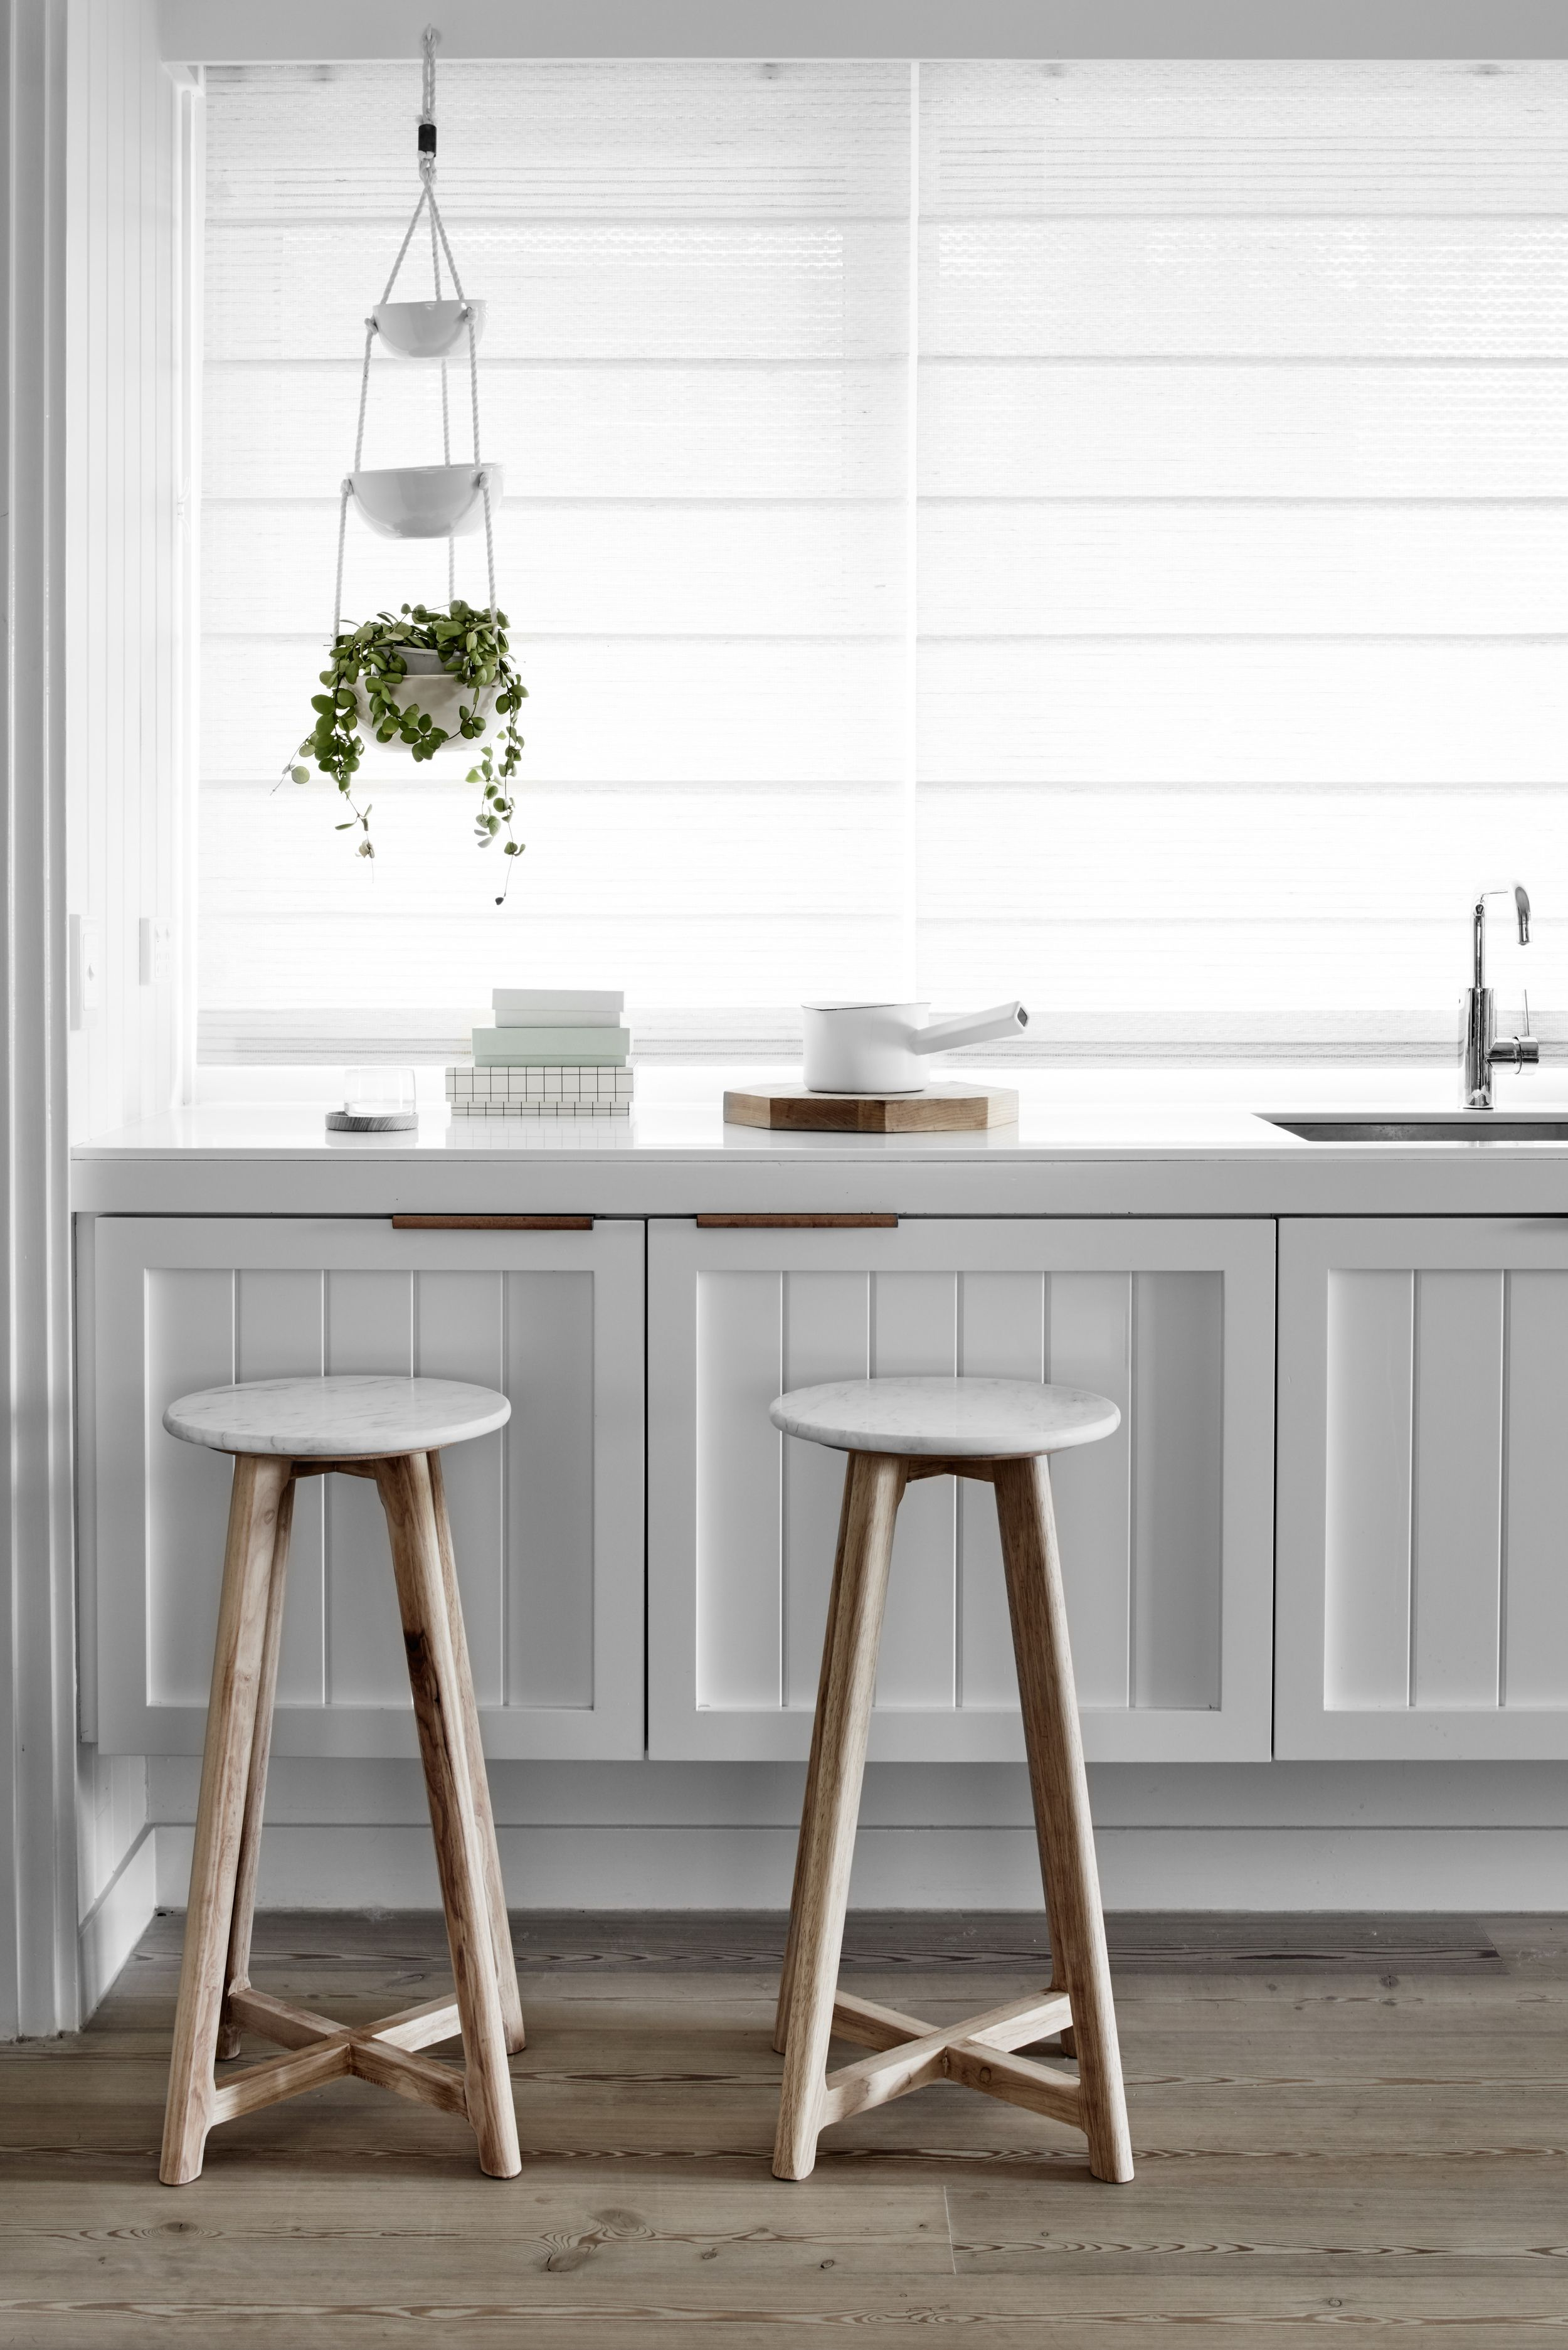 Swell Round Marble Stool Douglaston House Kitchen Stools Machost Co Dining Chair Design Ideas Machostcouk